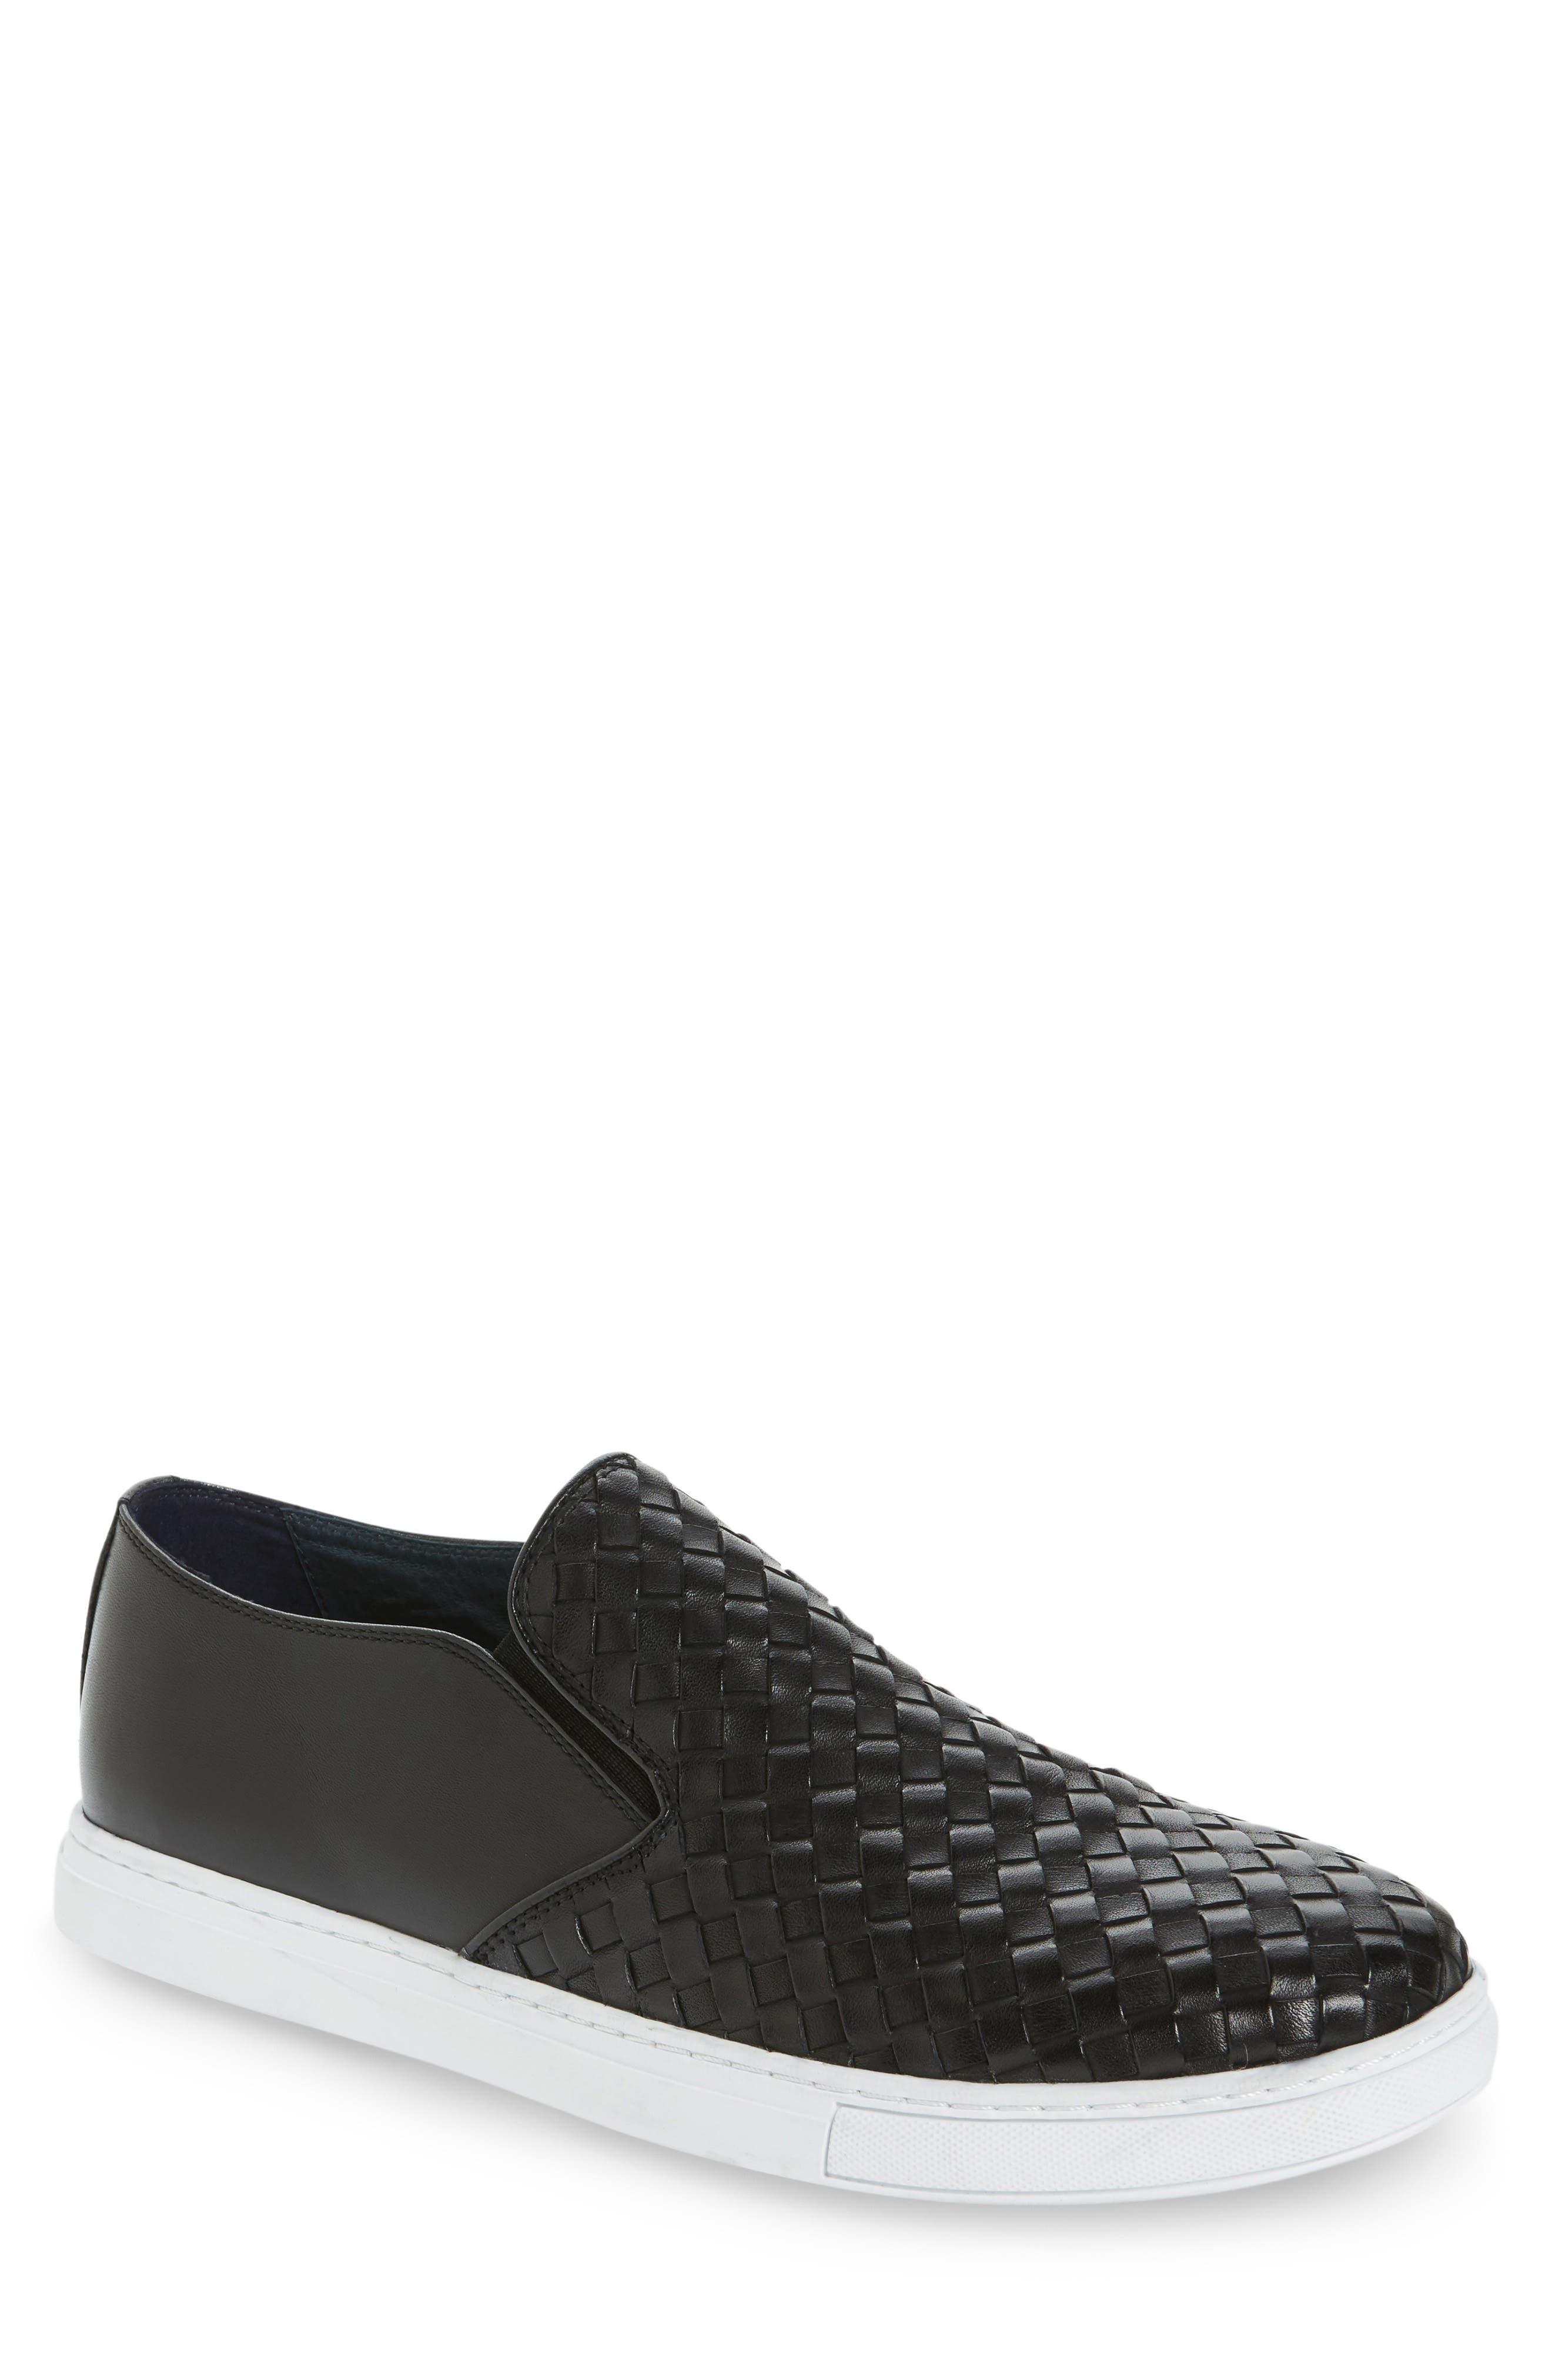 Echo Slip-On Sneaker,                             Main thumbnail 1, color,                             001